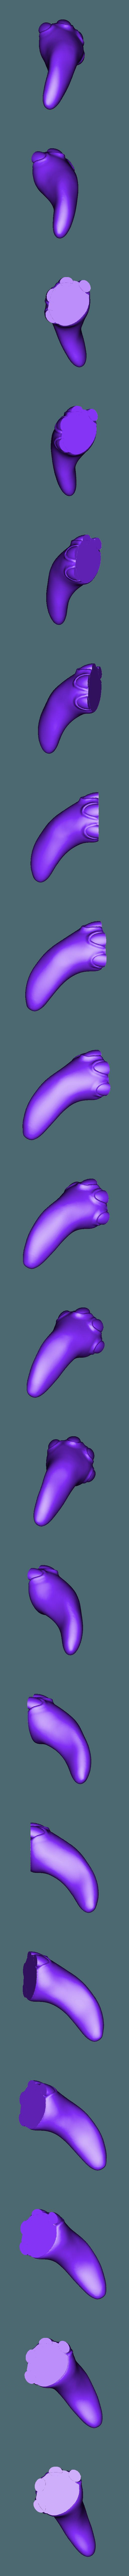 patte AV.stl Download STL file Turtle • 3D print model, didoff